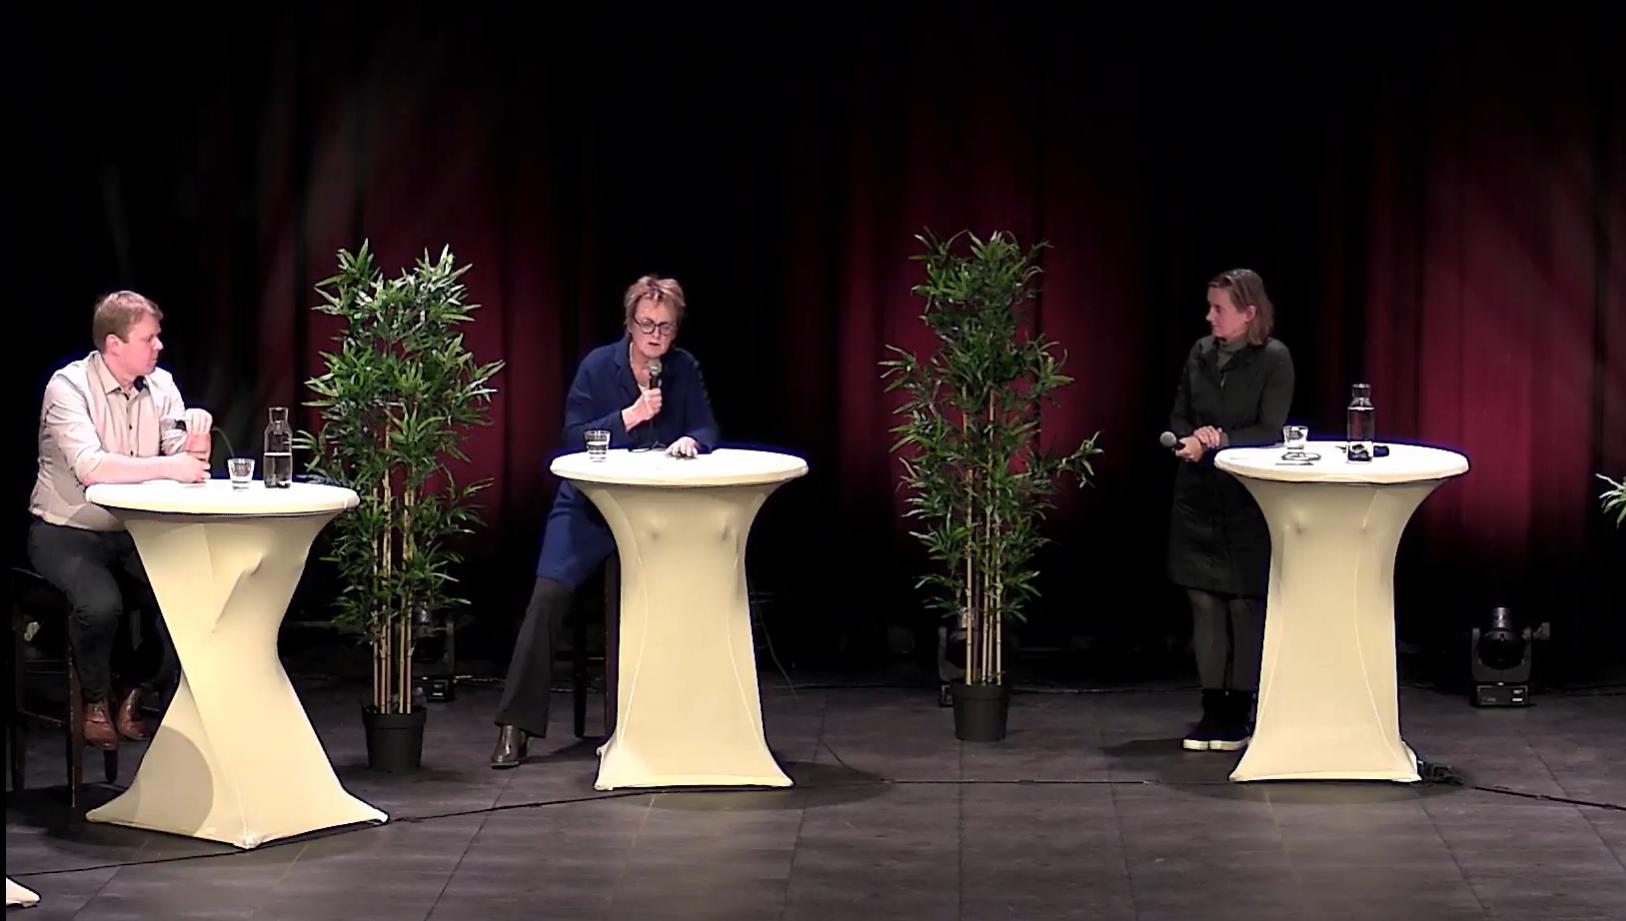 Online bijeenkomst over Domus Plus en Skaeve Huse, storm van ontevredenheid en boosheid onder Haarlemmers op YouTube [video]